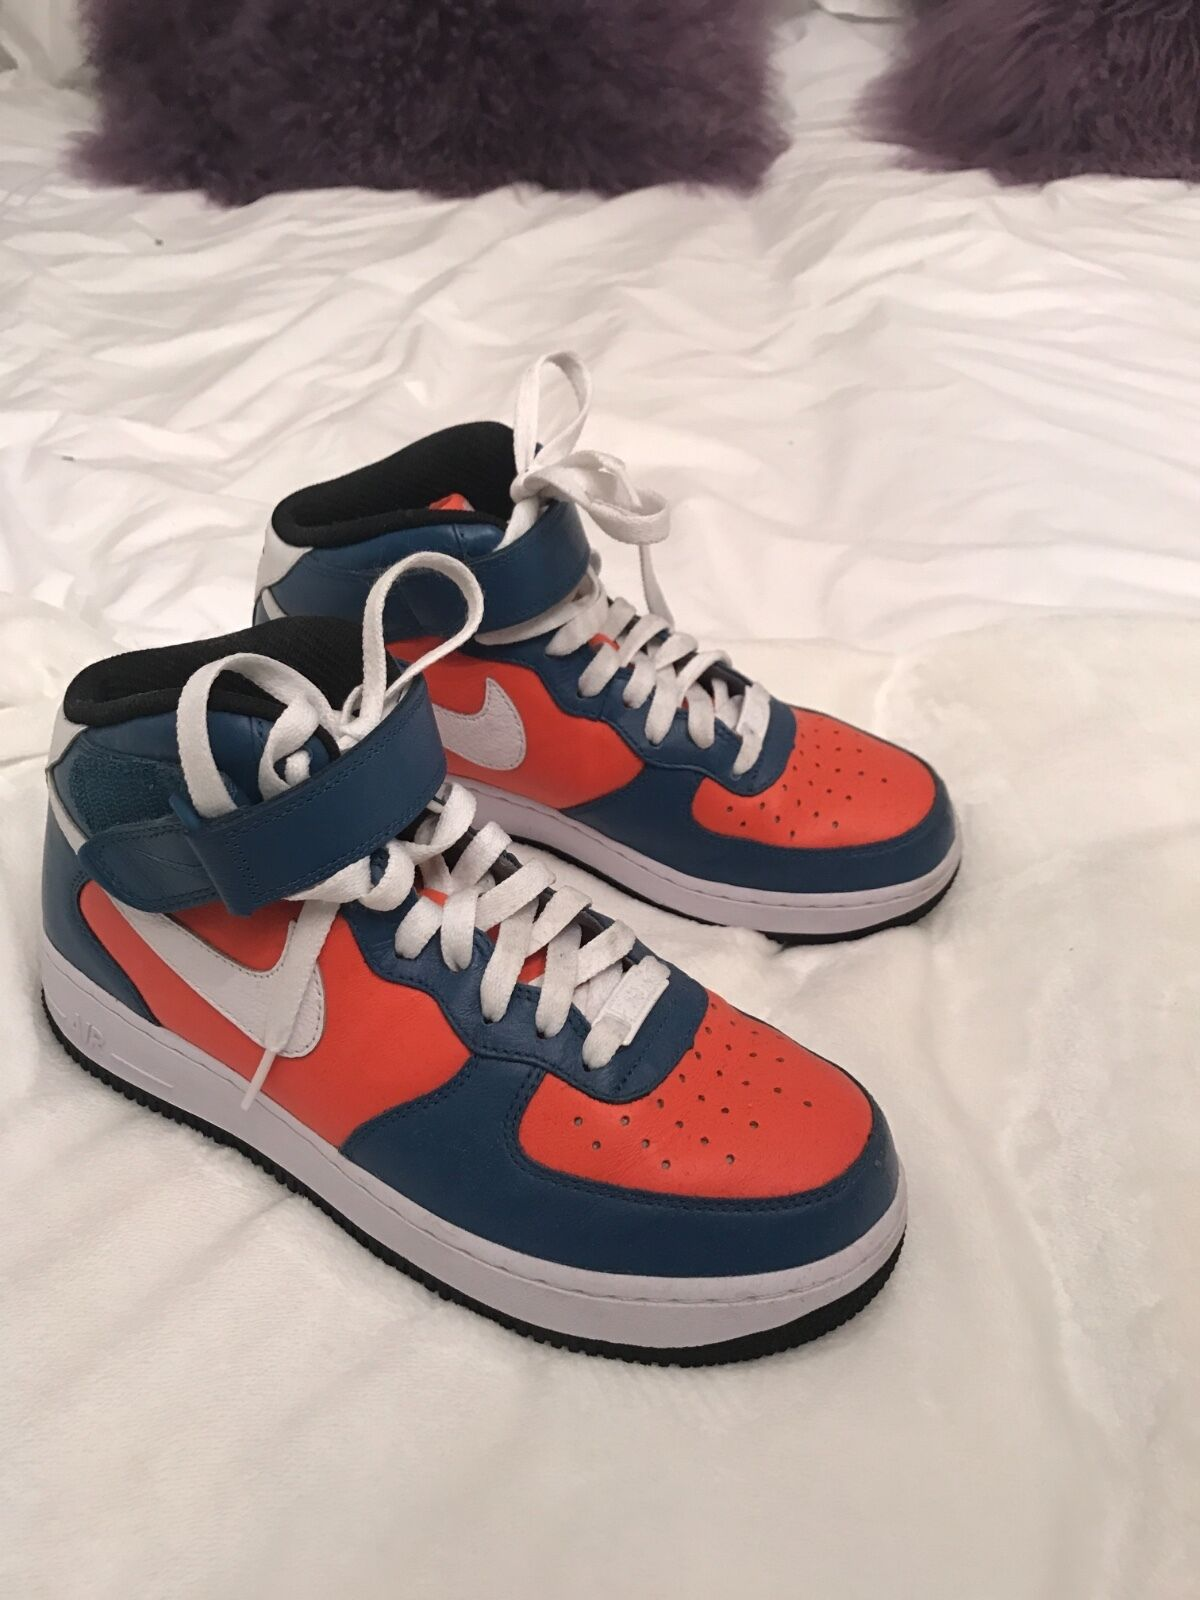 womens custom Nike high tops sneakers size 8